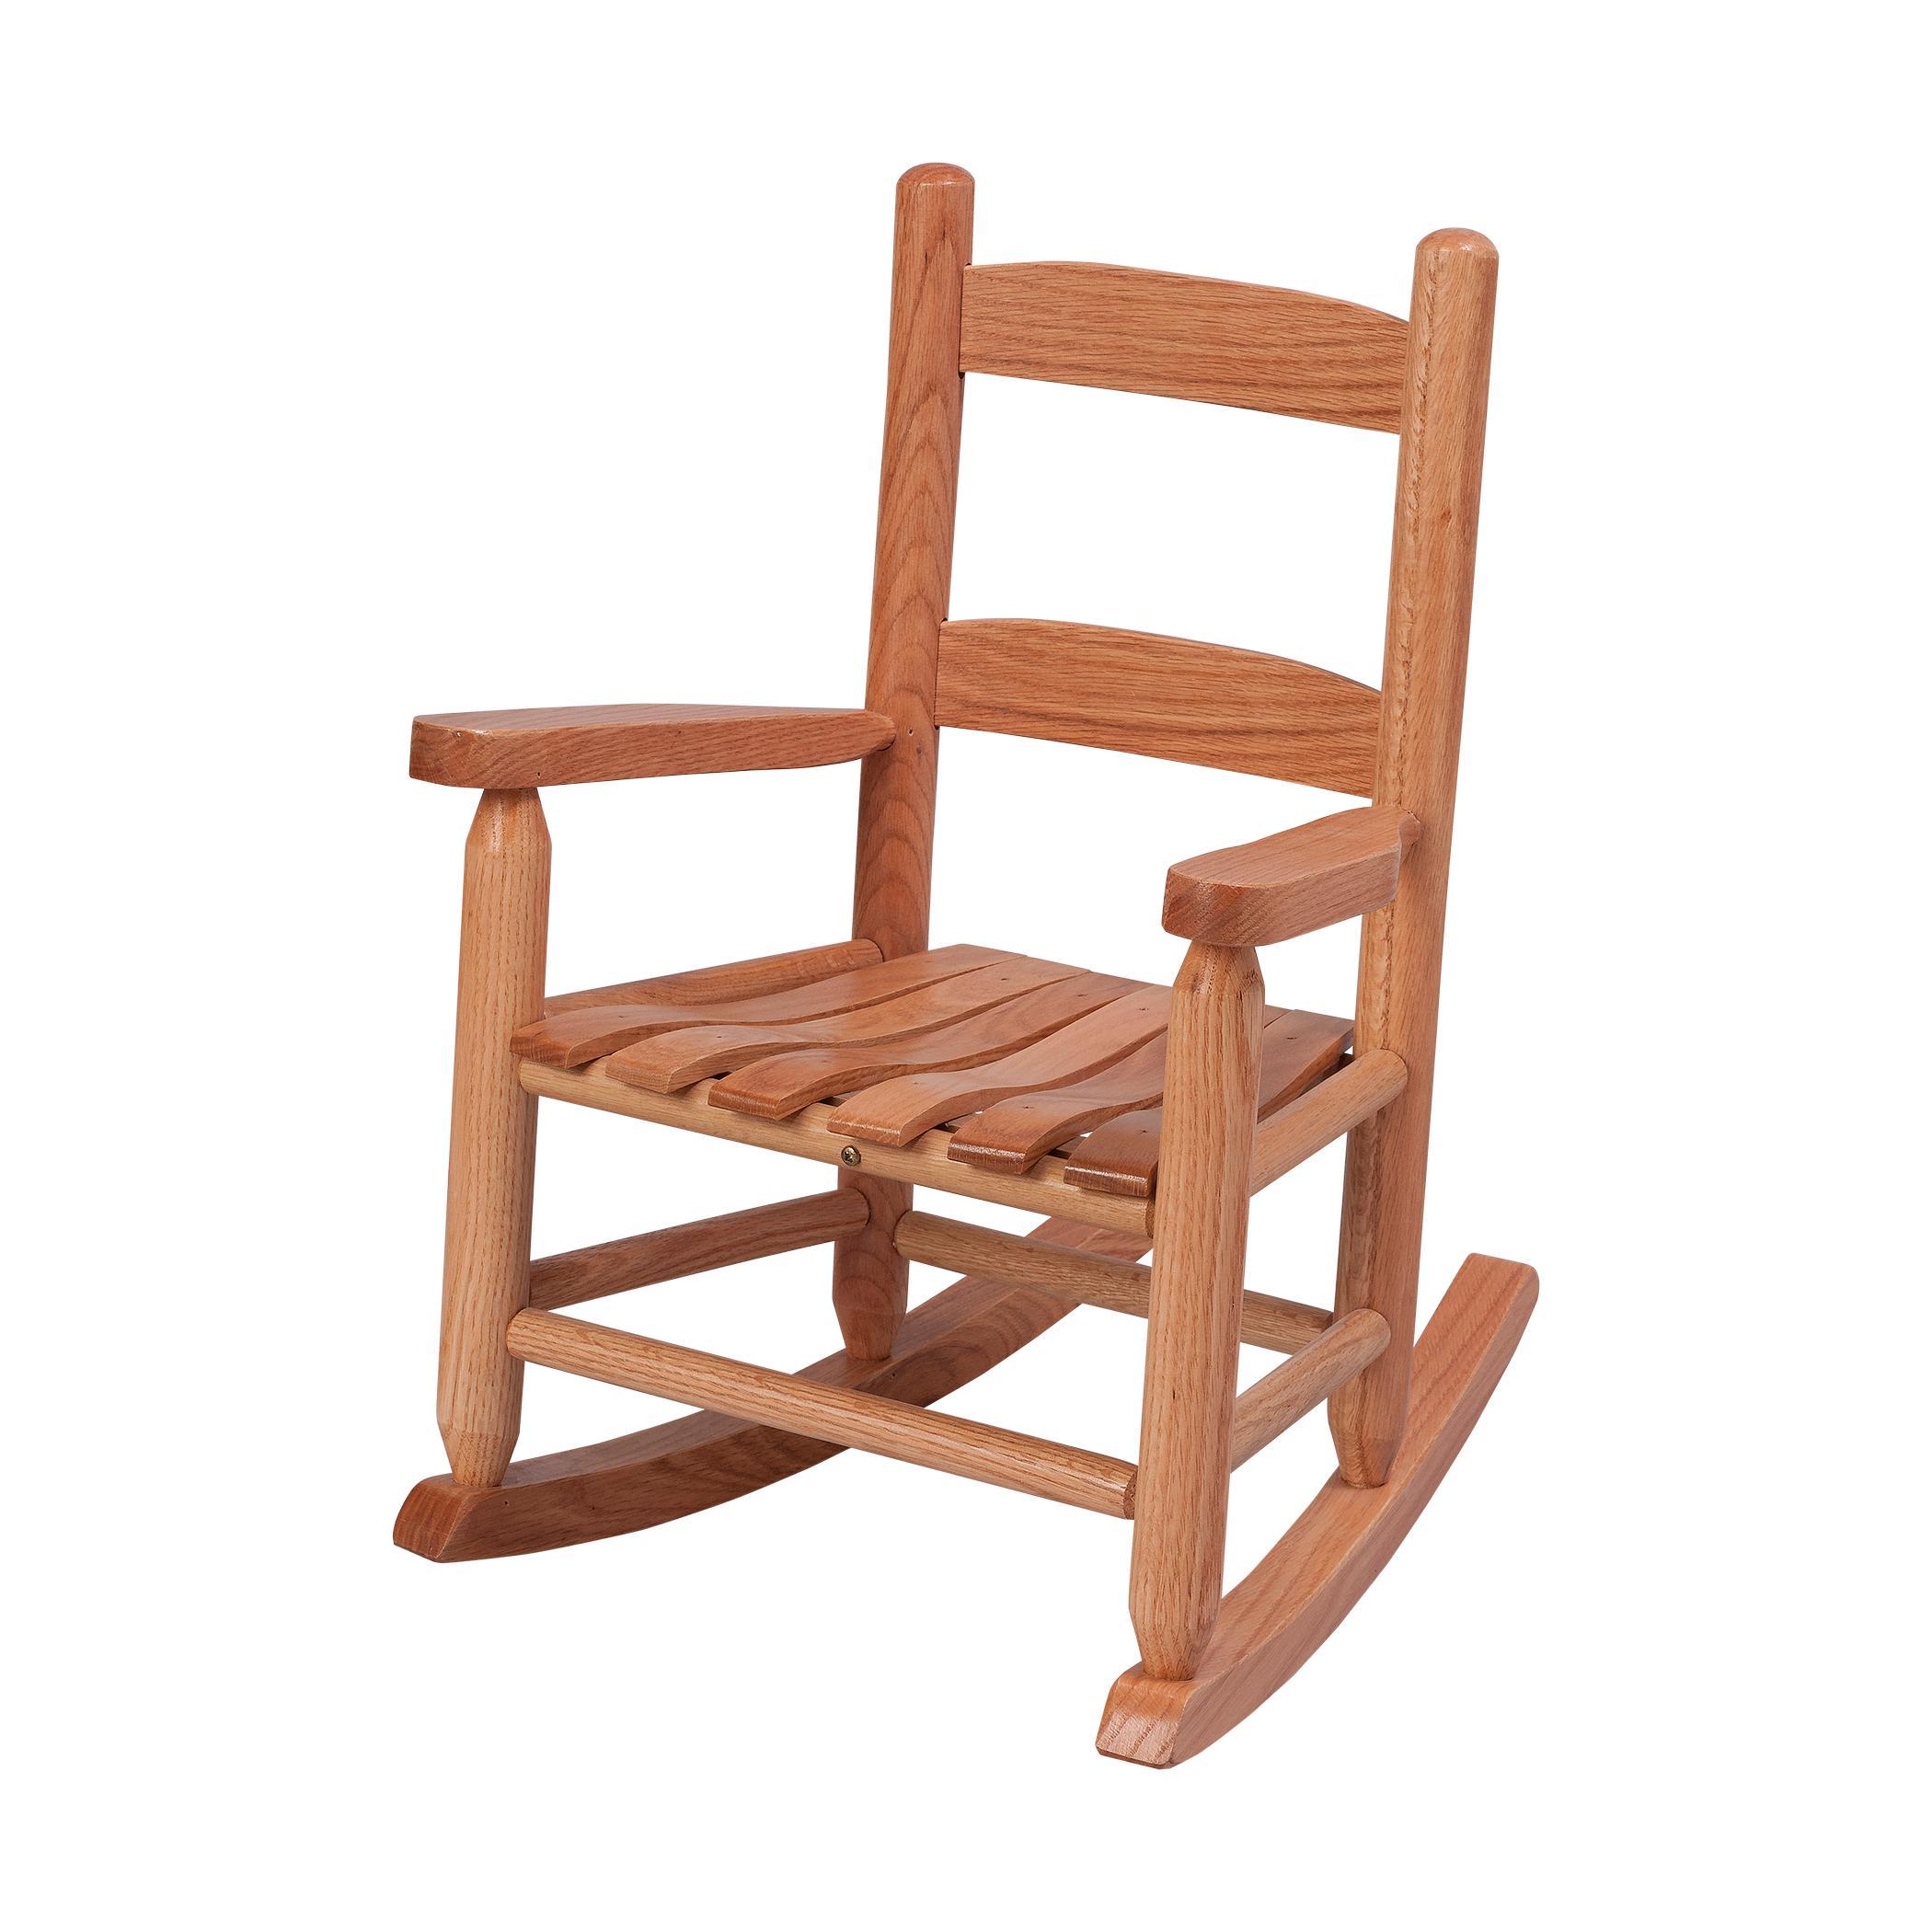 troutman rocking chairs portable beach hammock chair children s emilie rocker clear finish